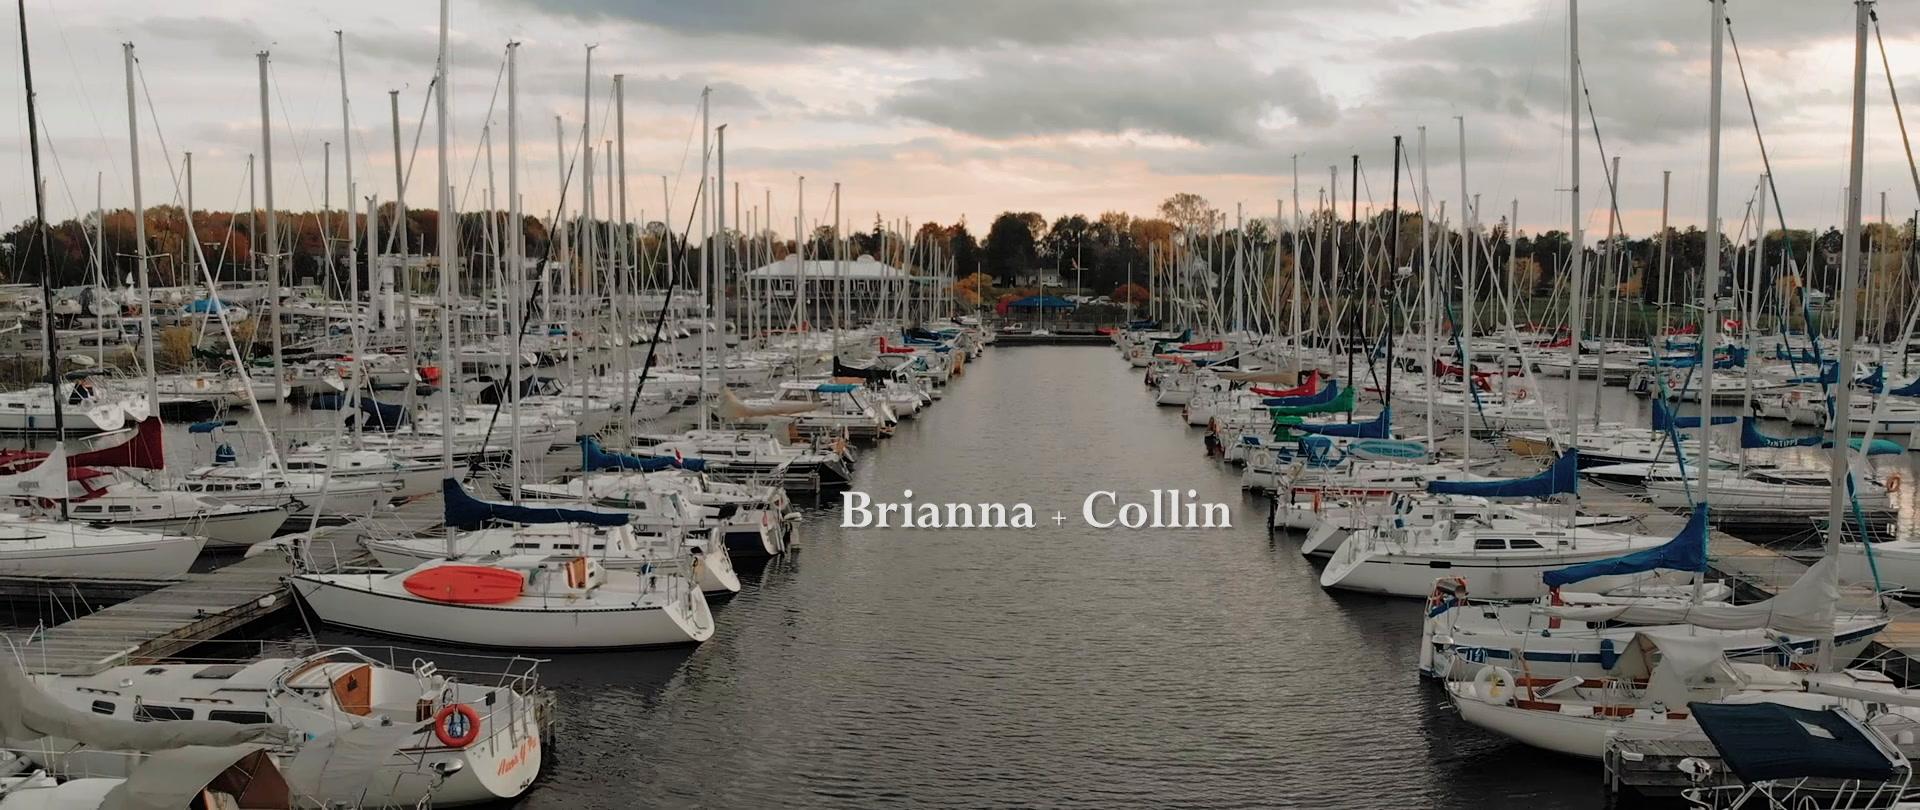 Brianna + Colin   Ottawa, Canada   Lone Star Ranch and Catering